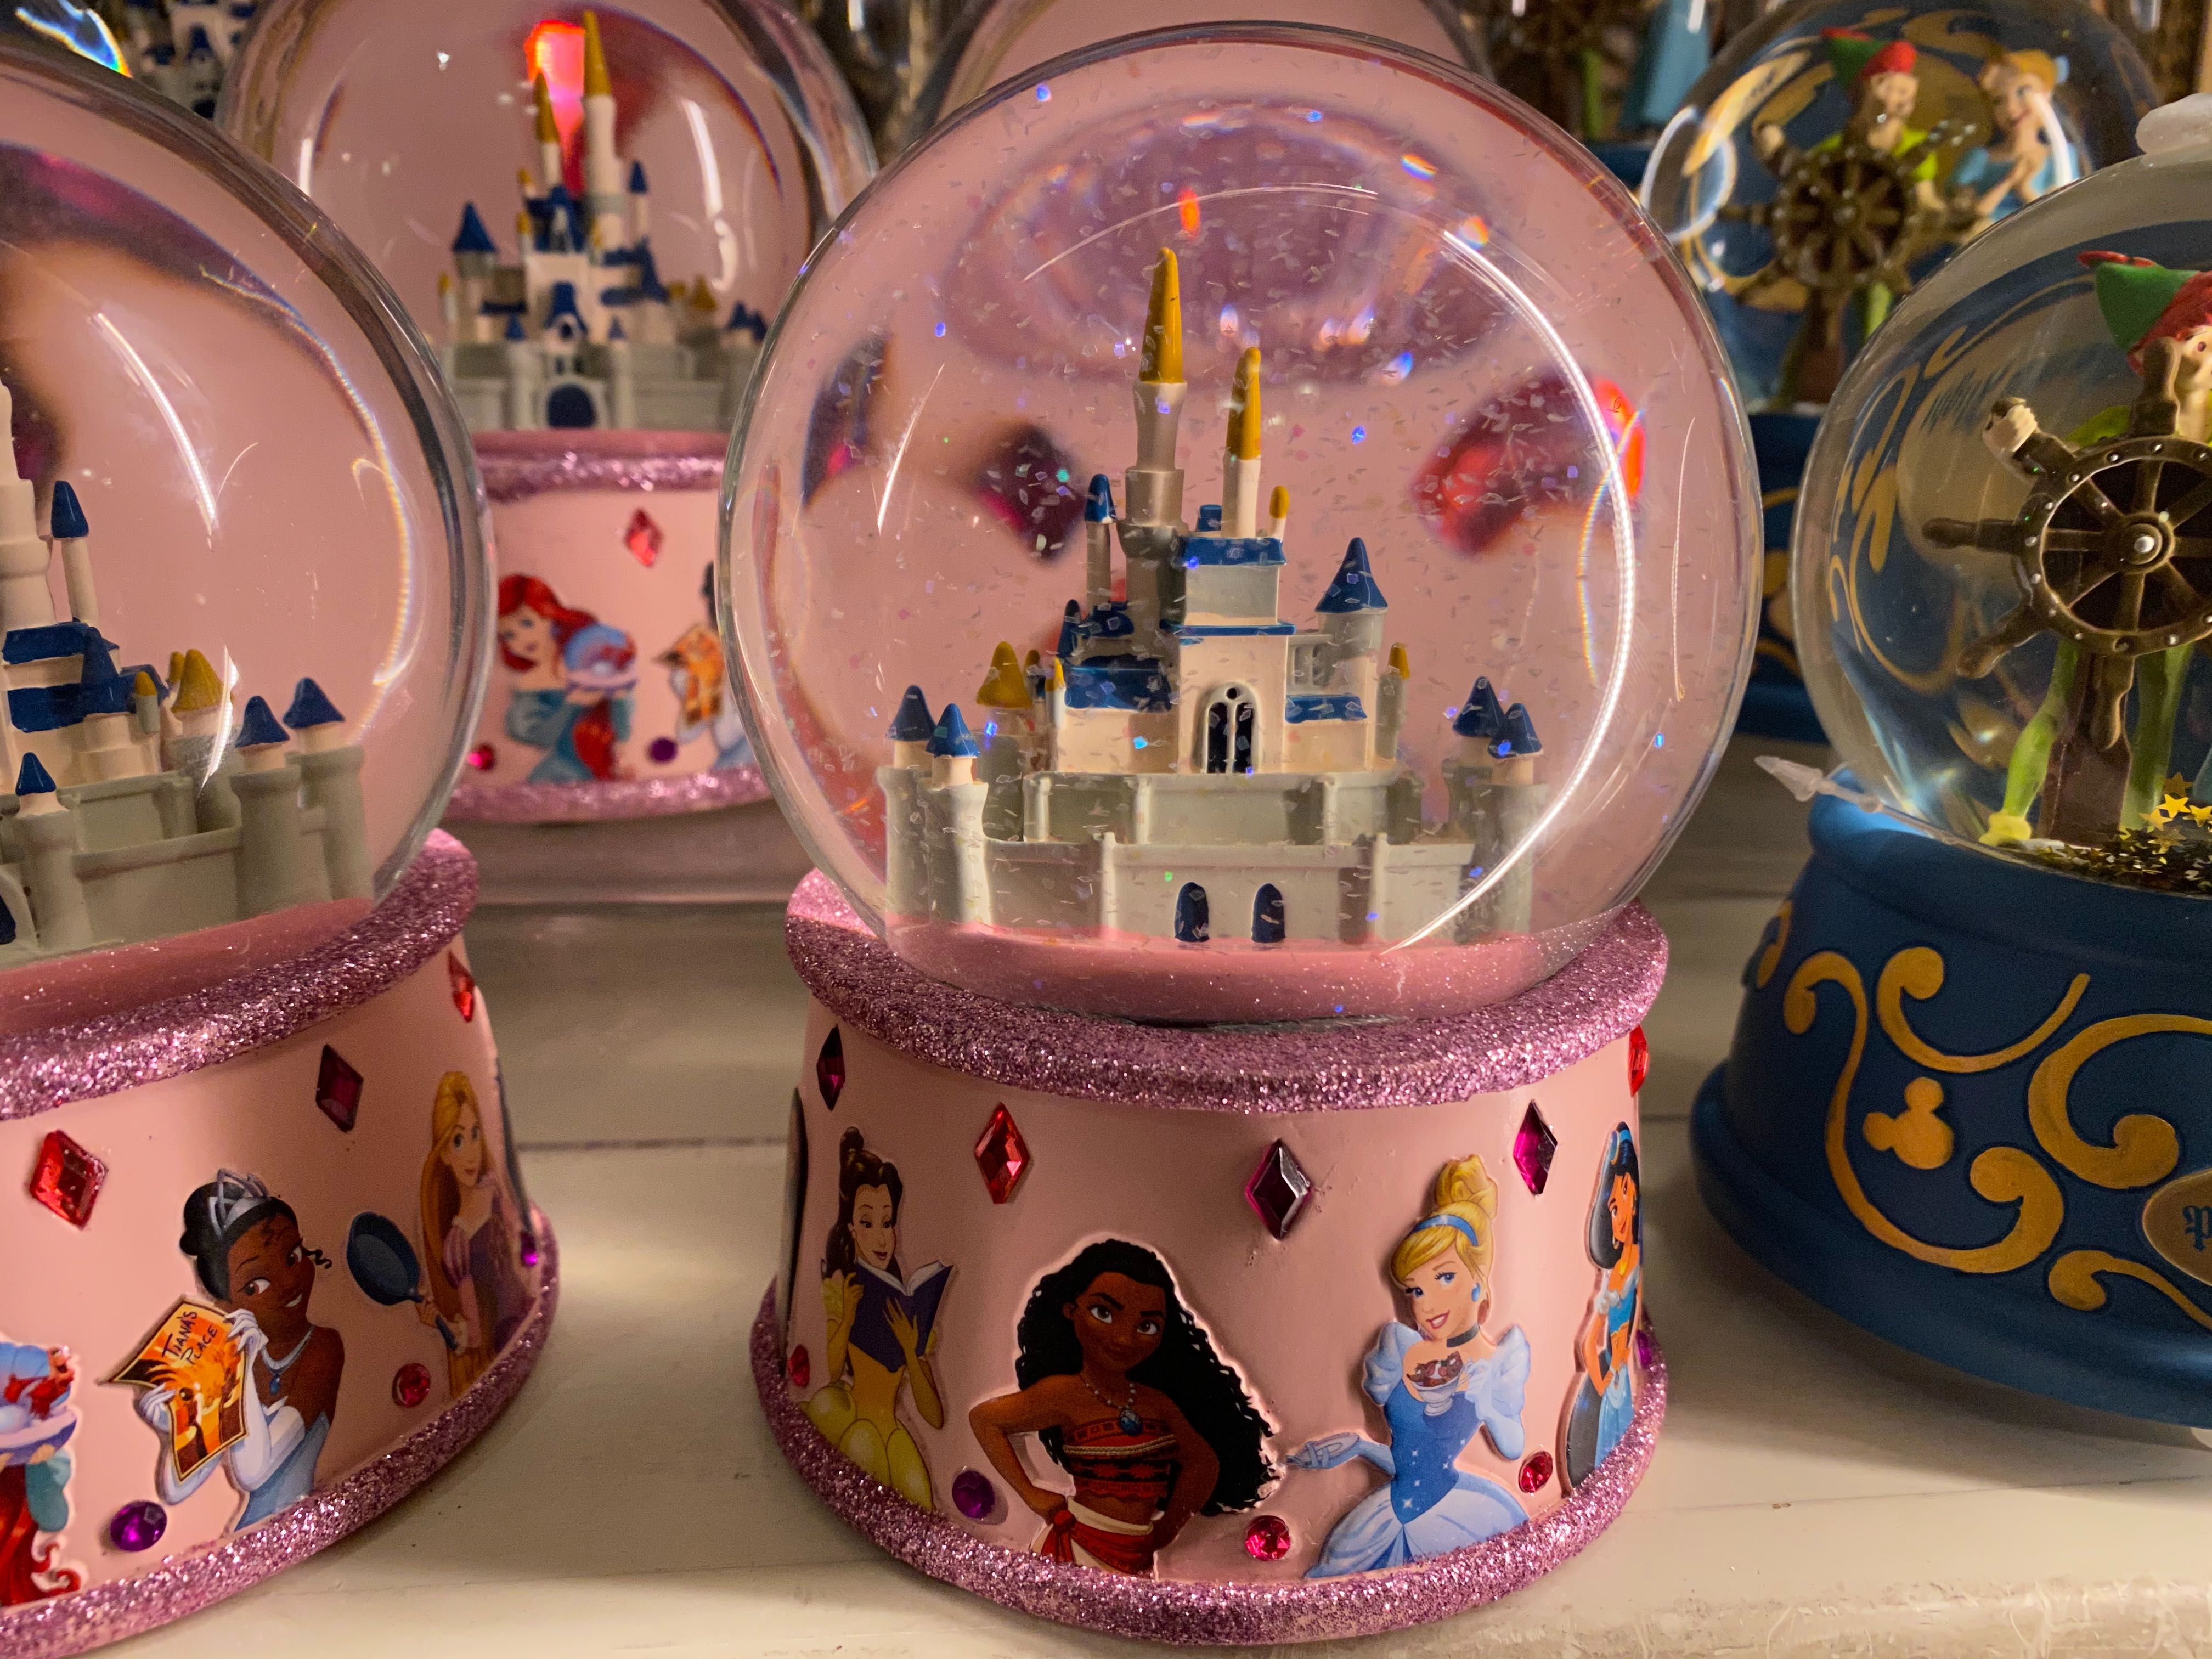 disneyland-princess-kids-merchandise-02-16-2020-7.jpg